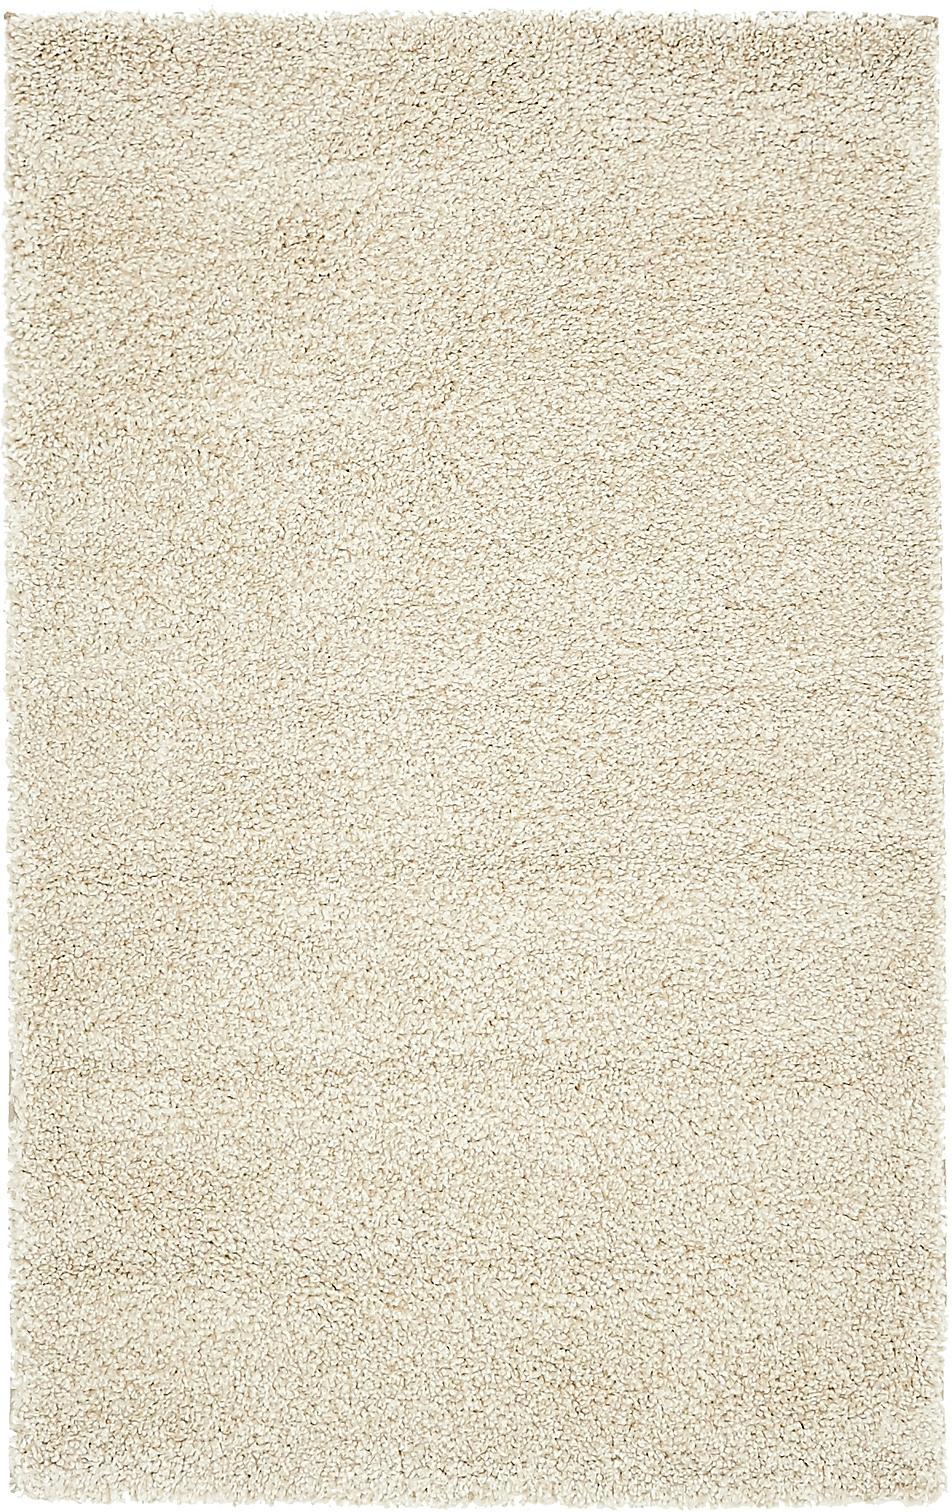 ivory 3' 3 x 5' 3 solid frieze rug | area rugs | esalerugs